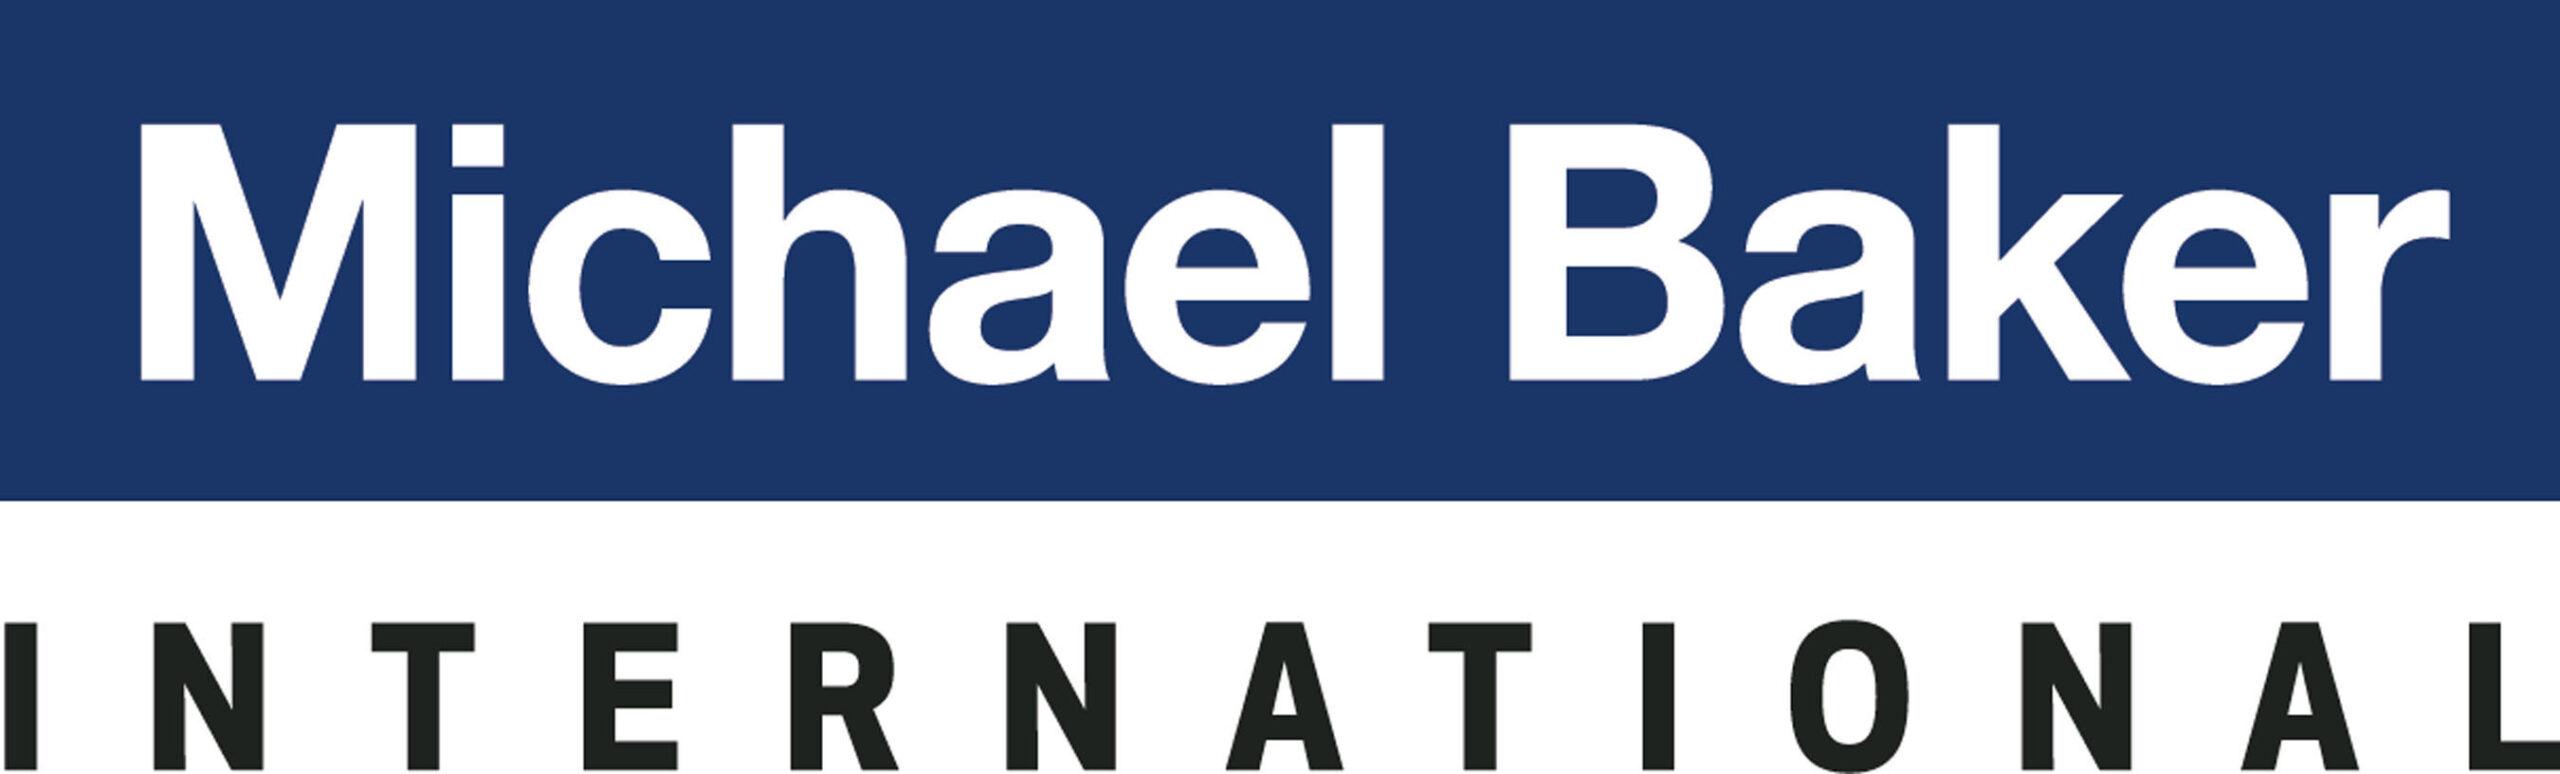 Michael Baker International (PRNewsFoto/Michael Baker International)